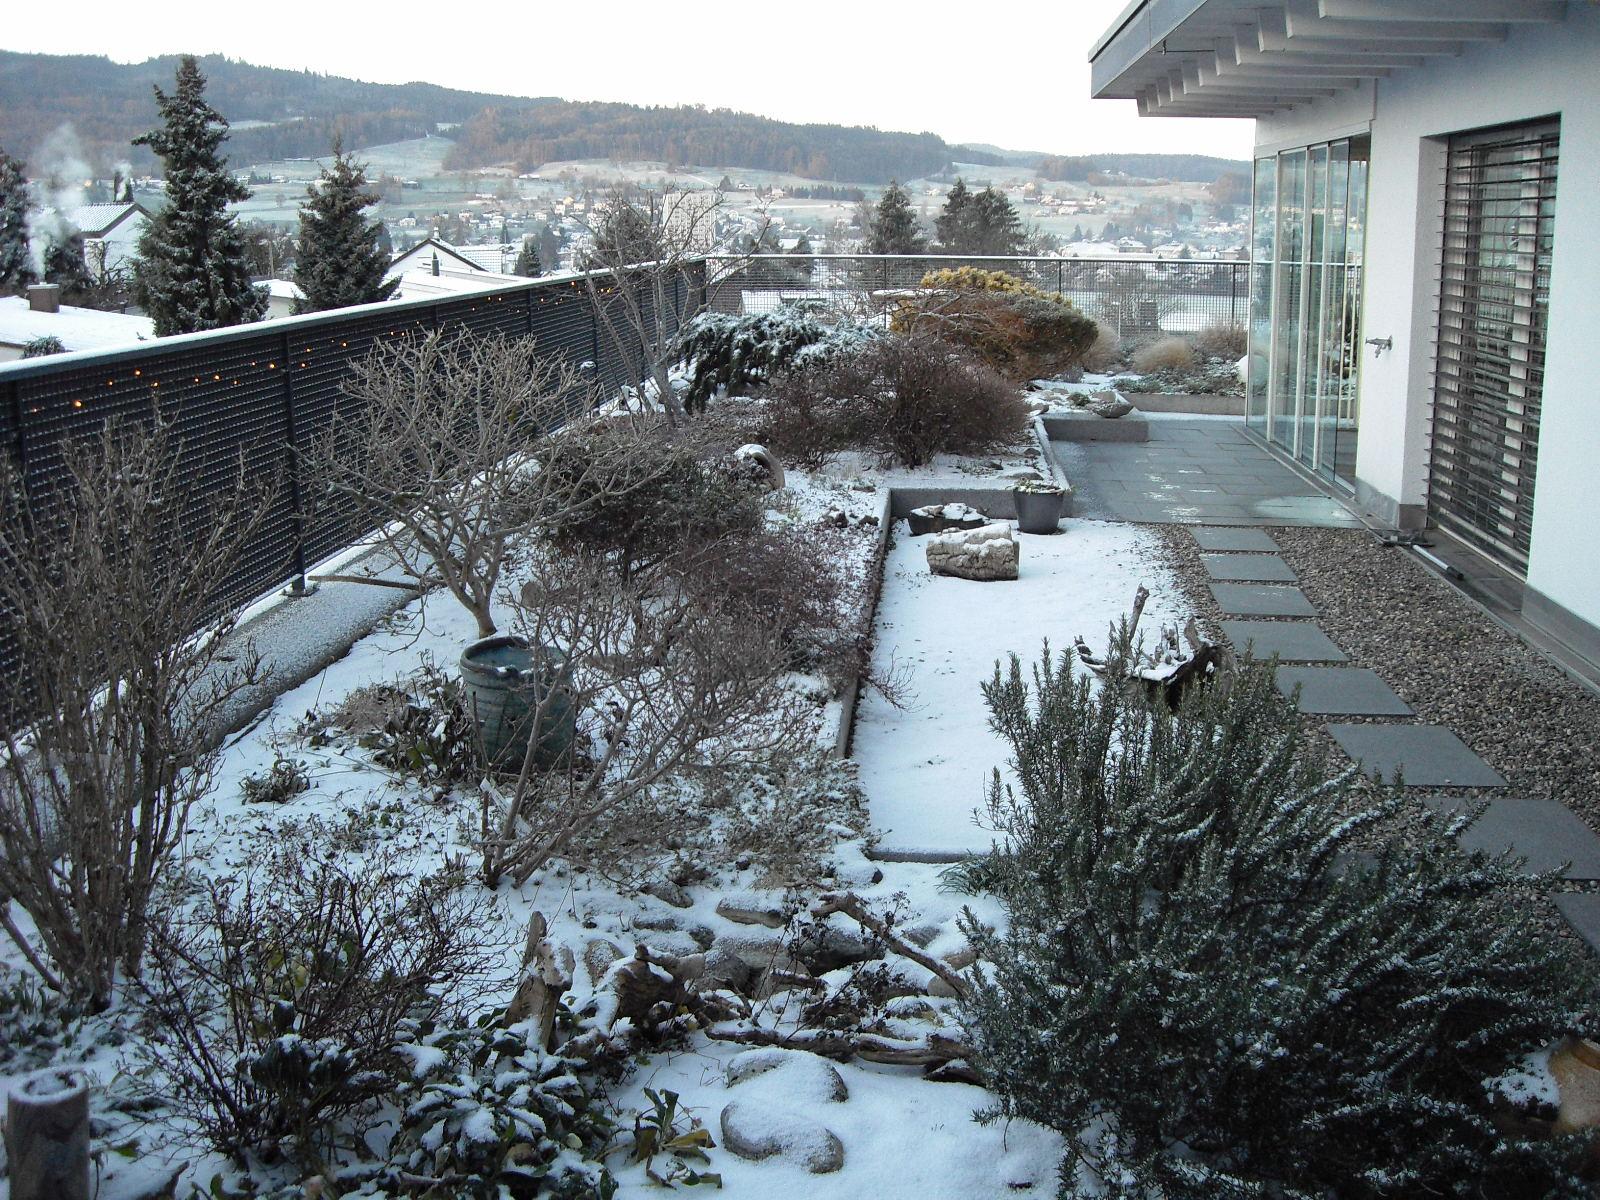 Erster Schnee am 3.1.19